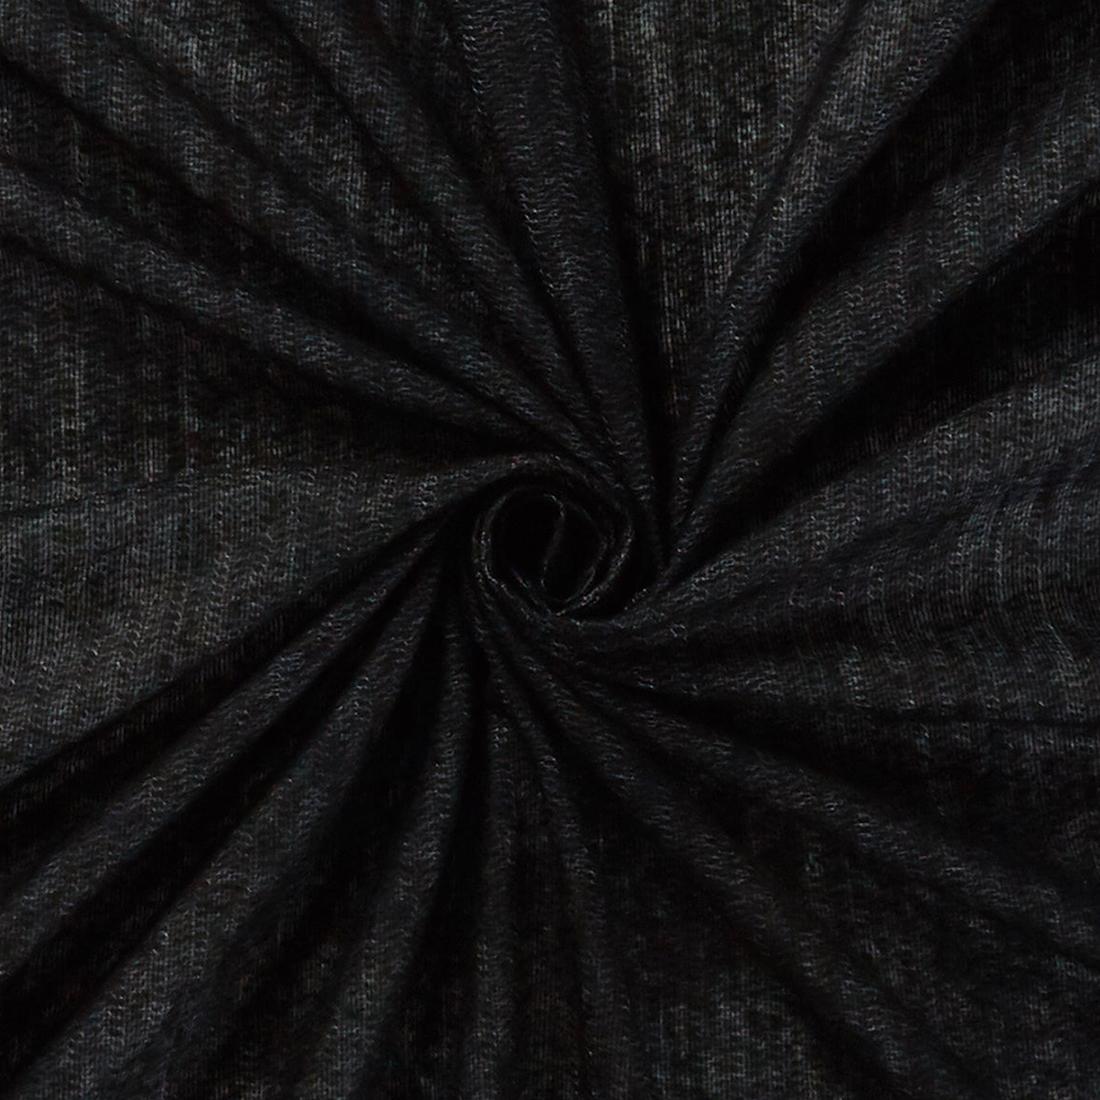 Stayflex Black Iron On Interfacing